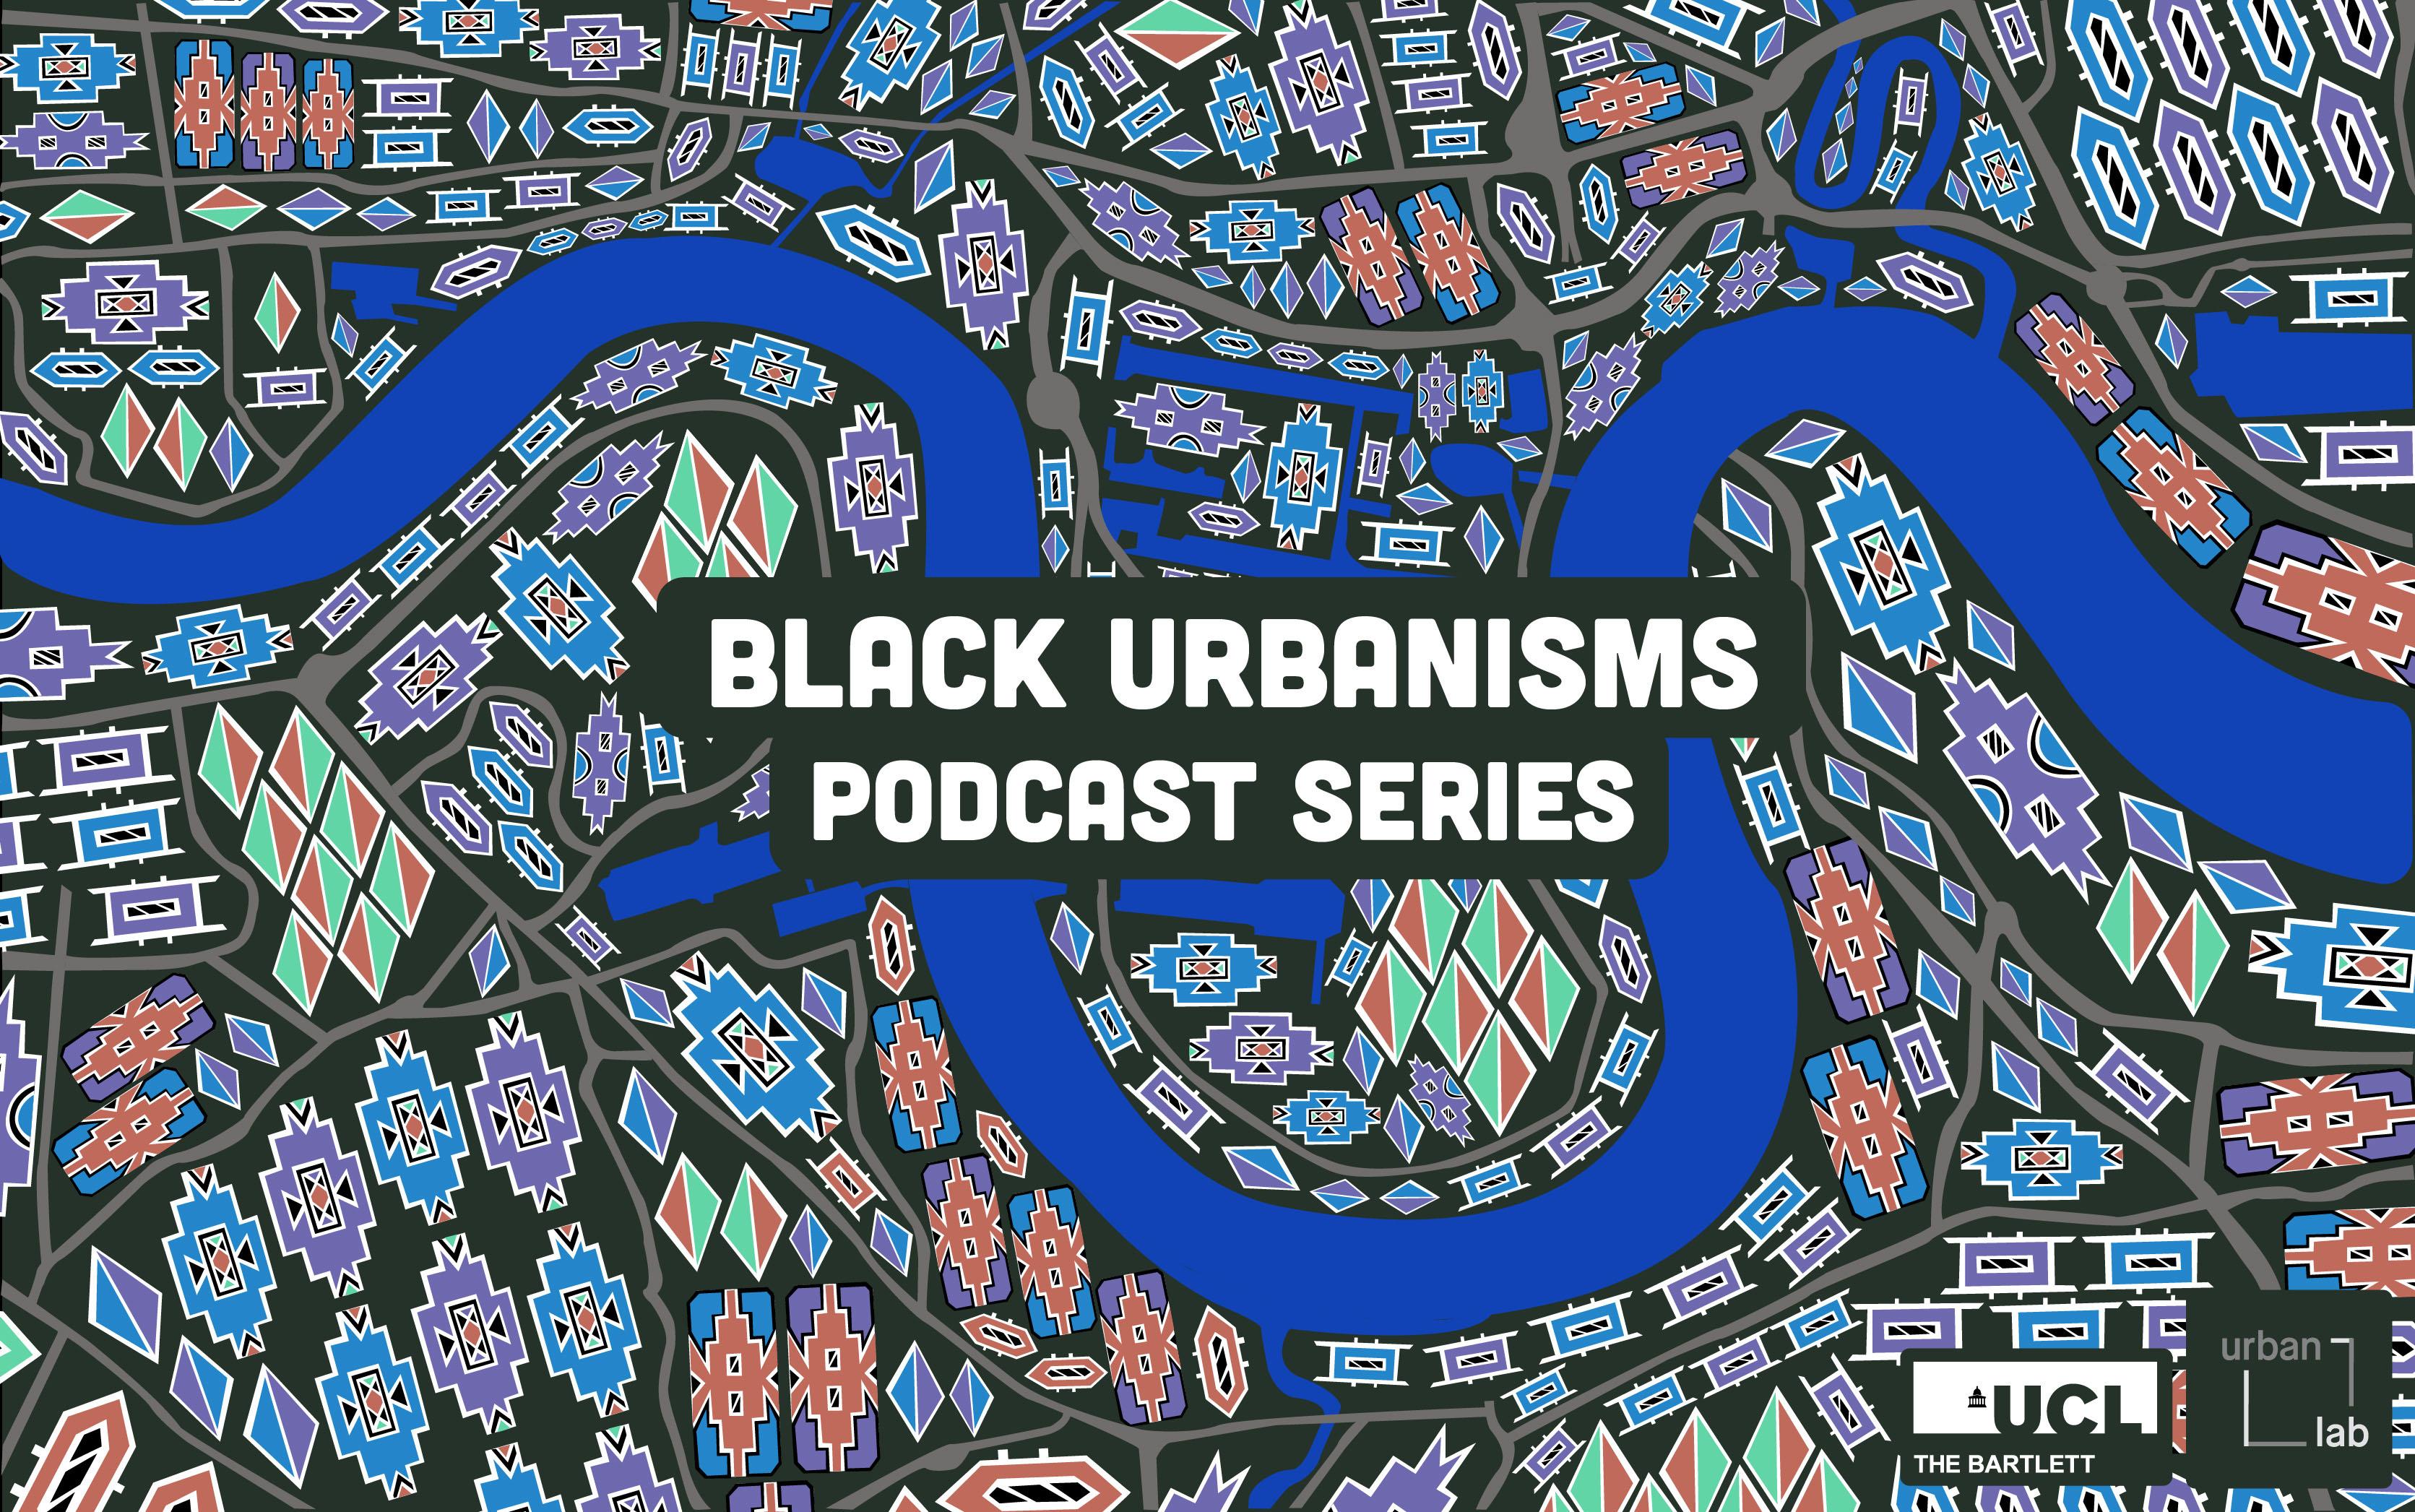 Black Urbanisms podcast series